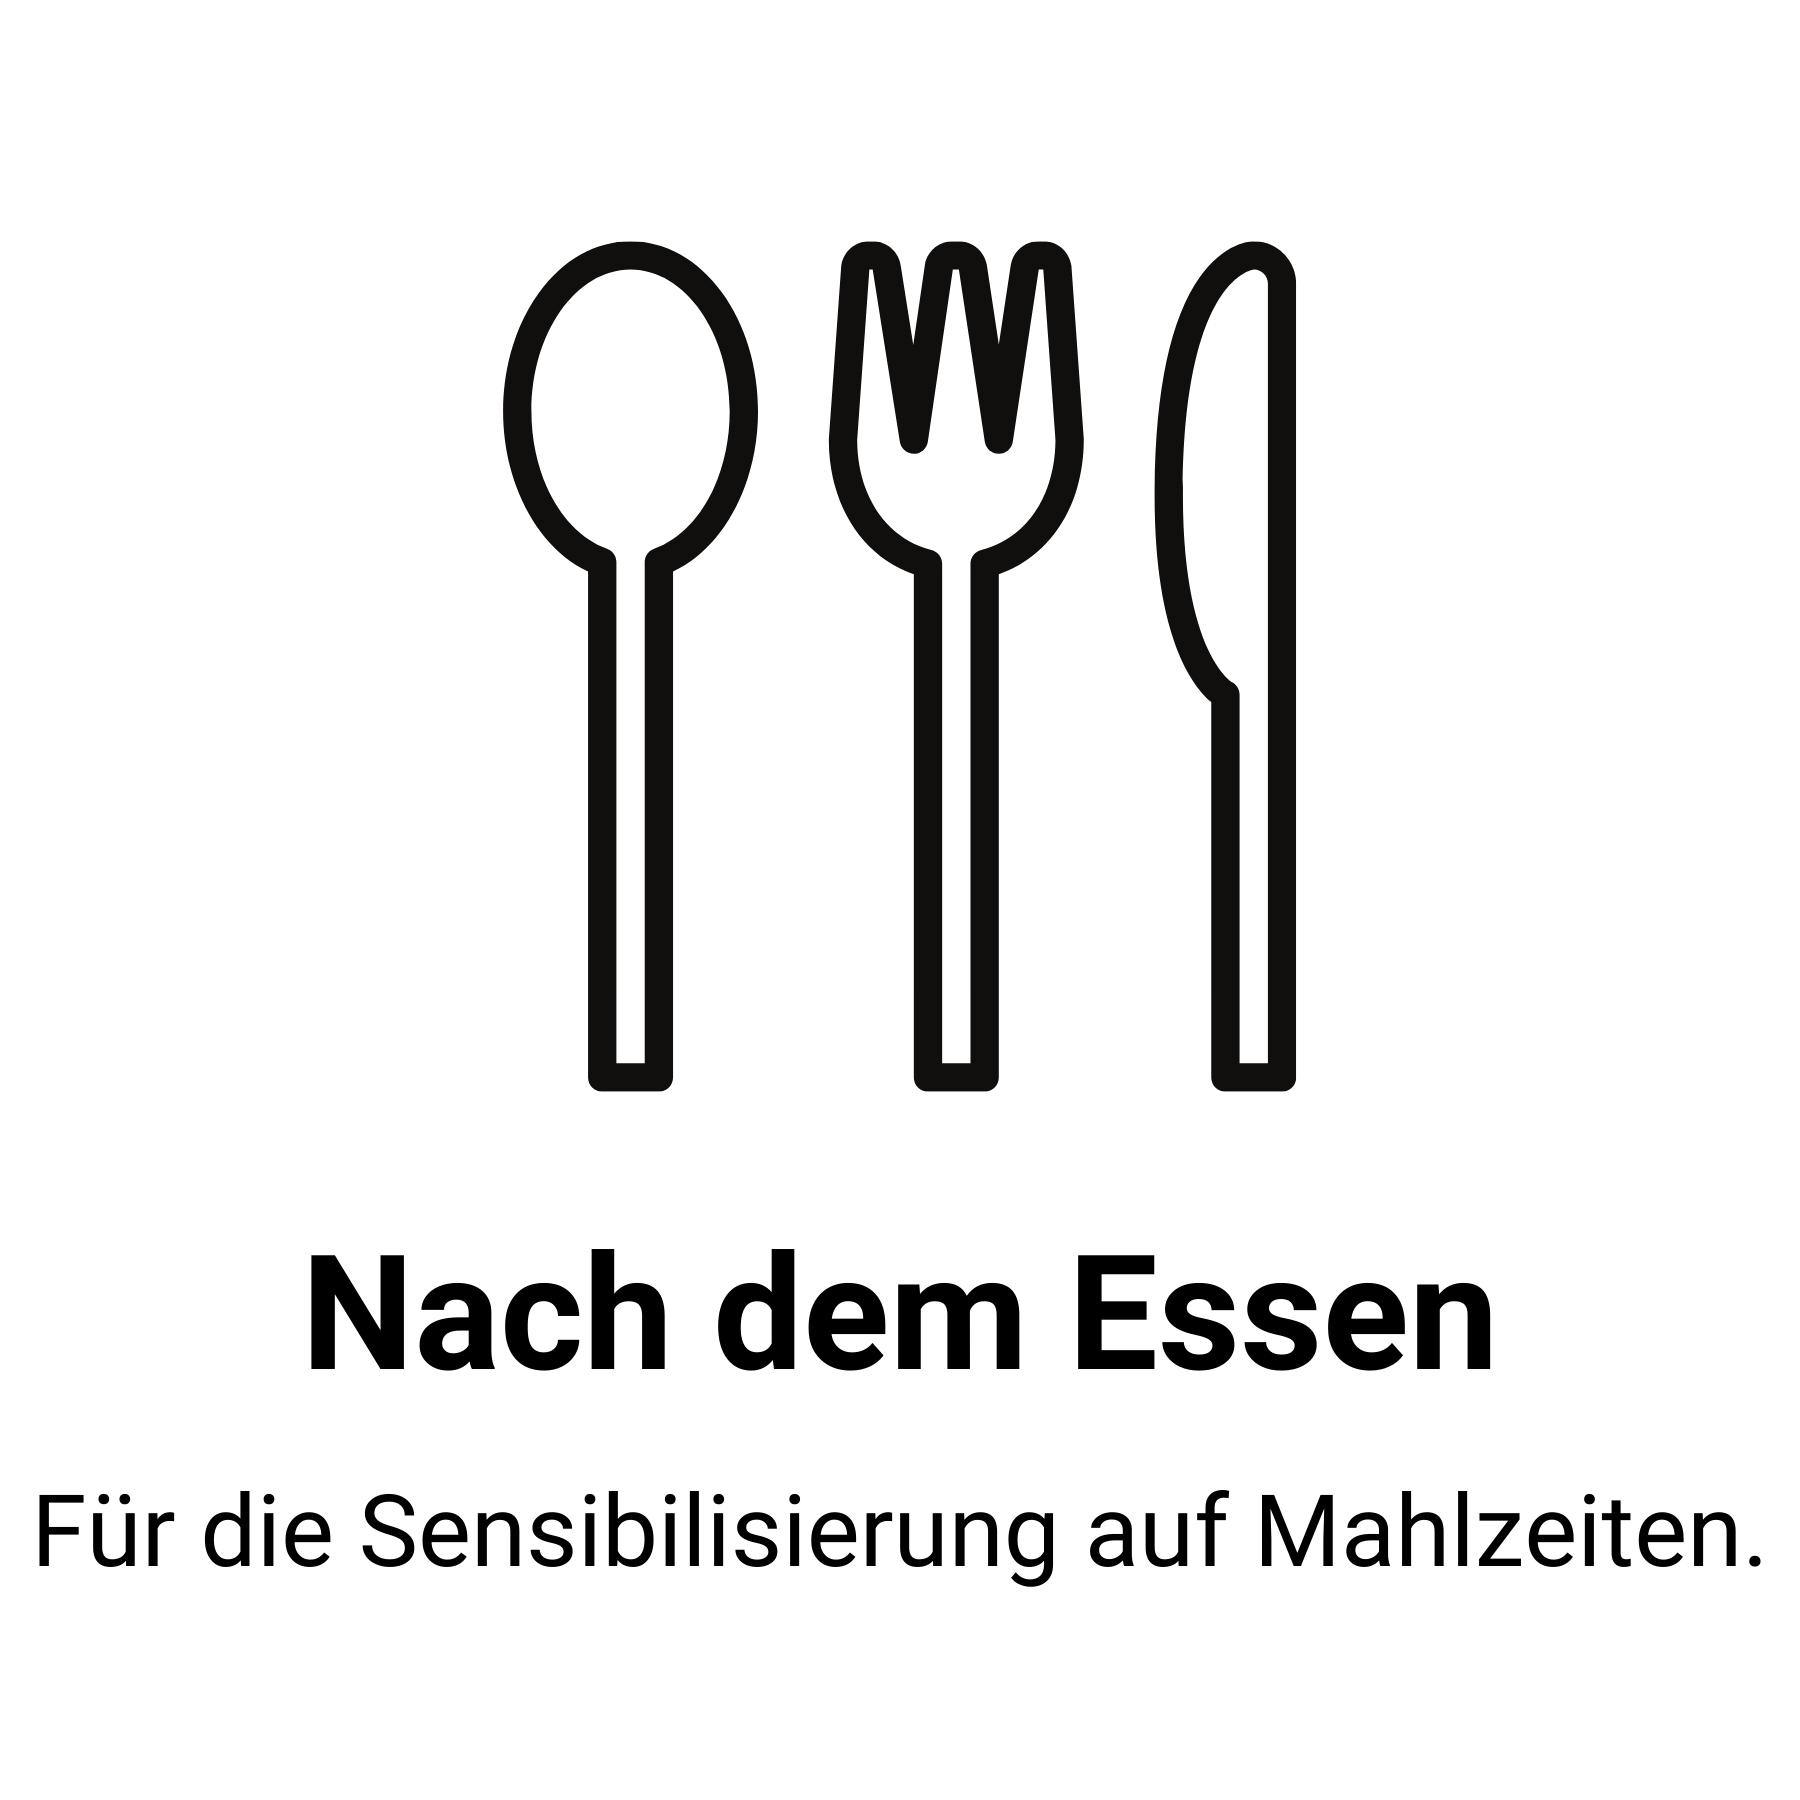 Koch & Diätsassistent healivery